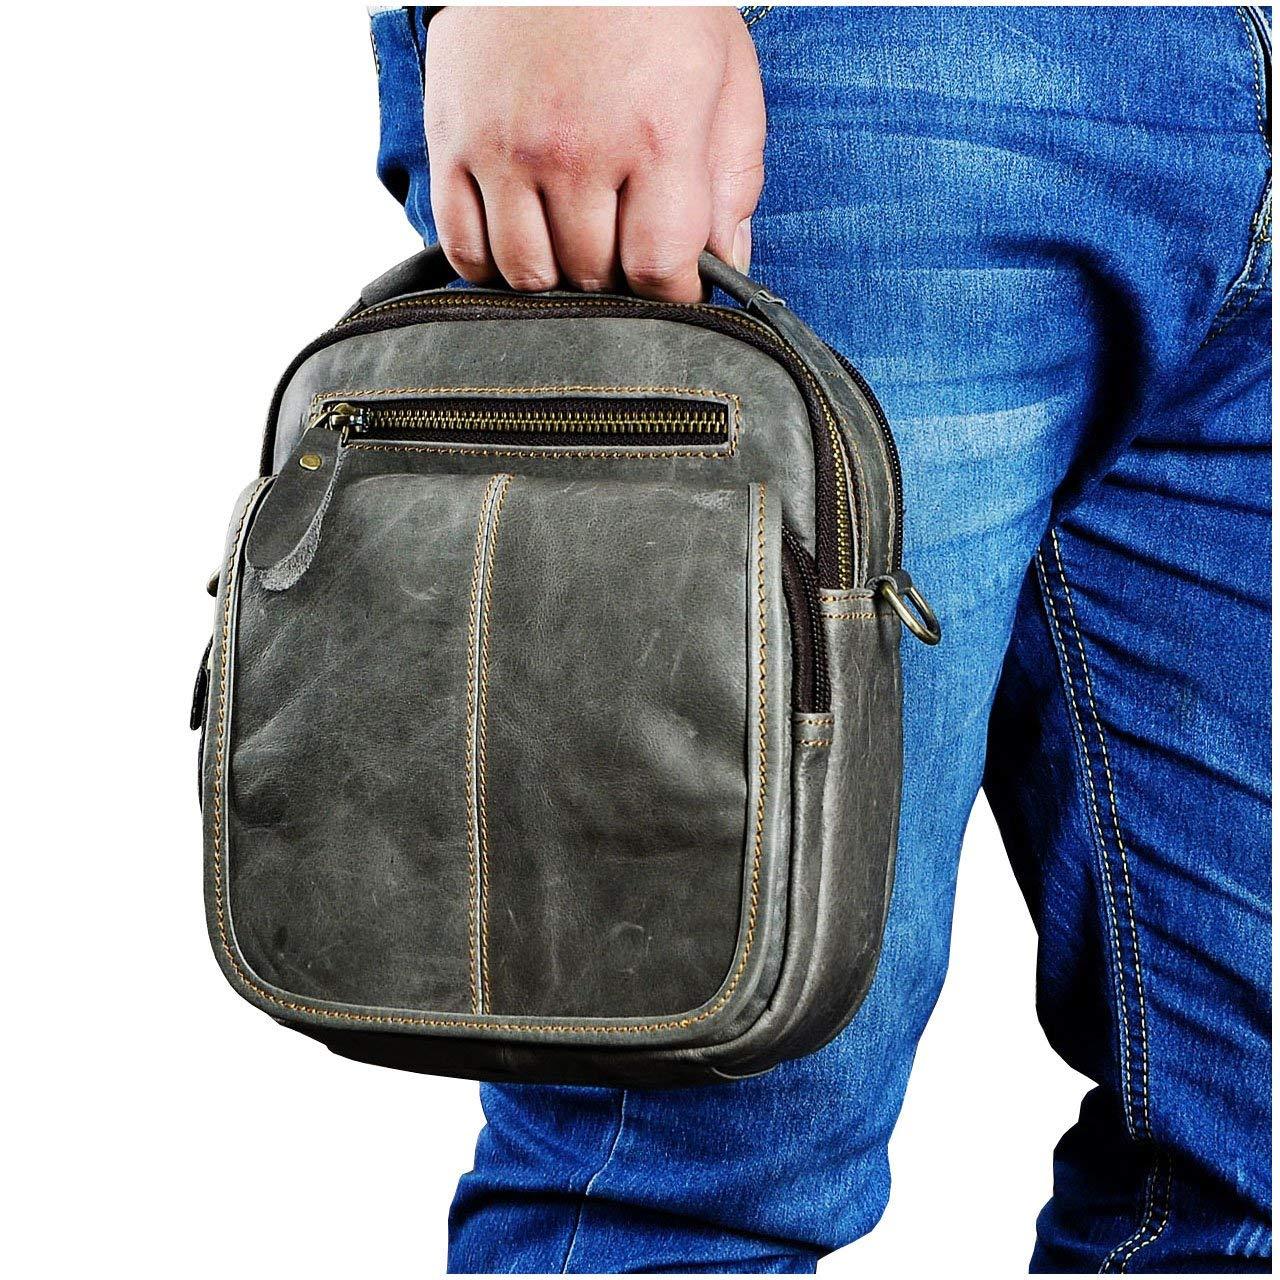 Get Quotations · Le aokuu Mens Leather Fashion Designer Casual Messenger  Shoulder Bag Organizer Hunting Fanny Waist Belt 5fc6fcac99cdb